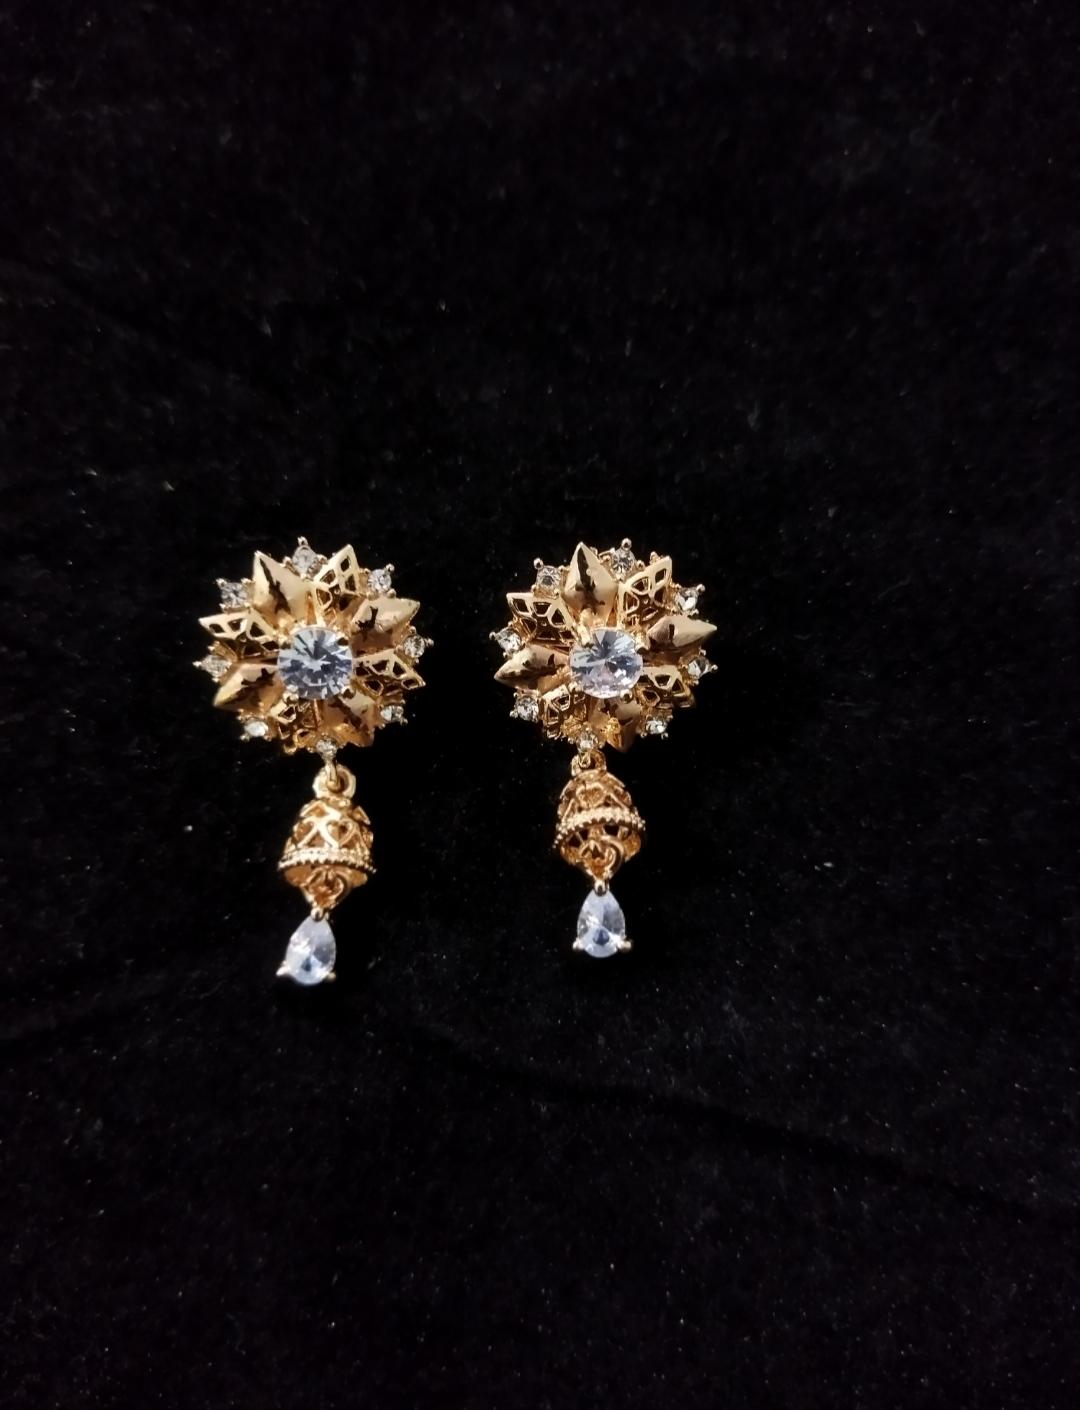 18 K Italian  Gold Plated Zircon Studded Ear Rings [ Jhumka Style] for Girls, Women